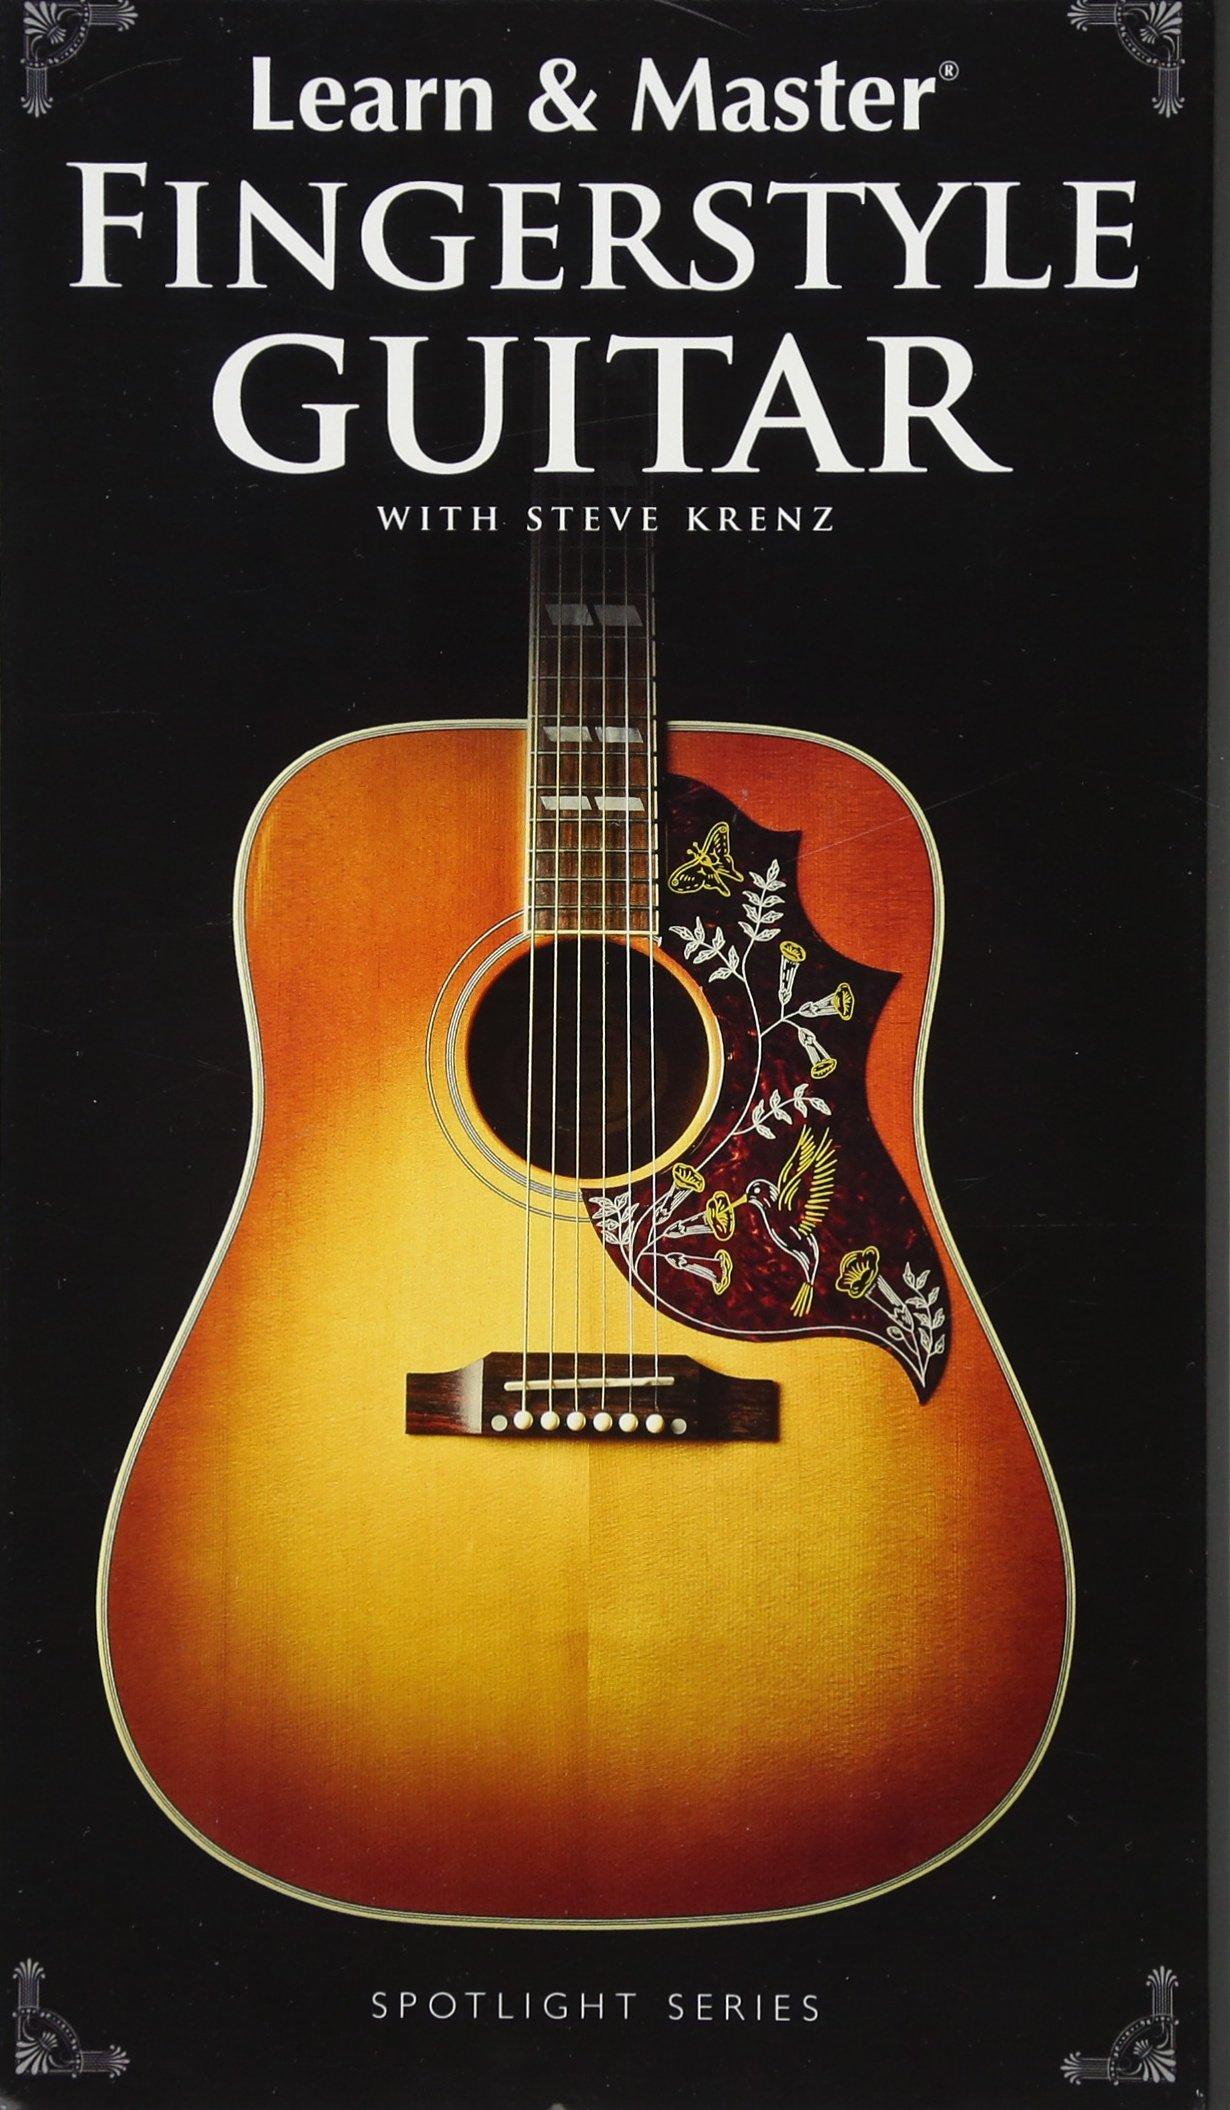 Learn Master Fngrstyl Gtr Bk/Cd/Dvds (Spotlight): Amazon.es: Krenz ...